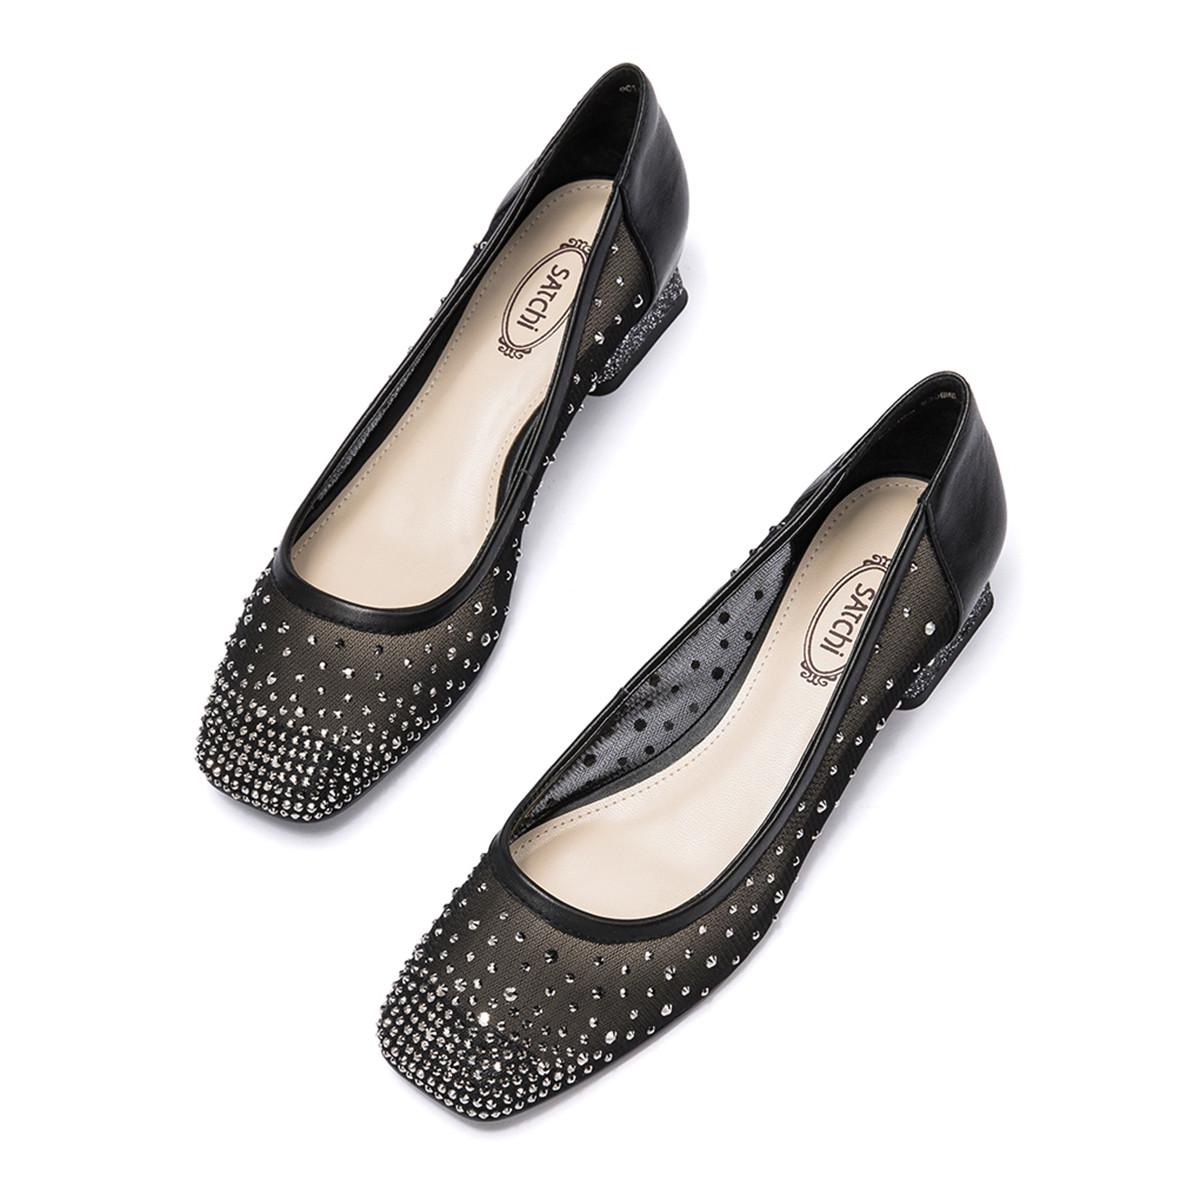 SATCHI 沙驰 9C16006S010 女士方头单鞋